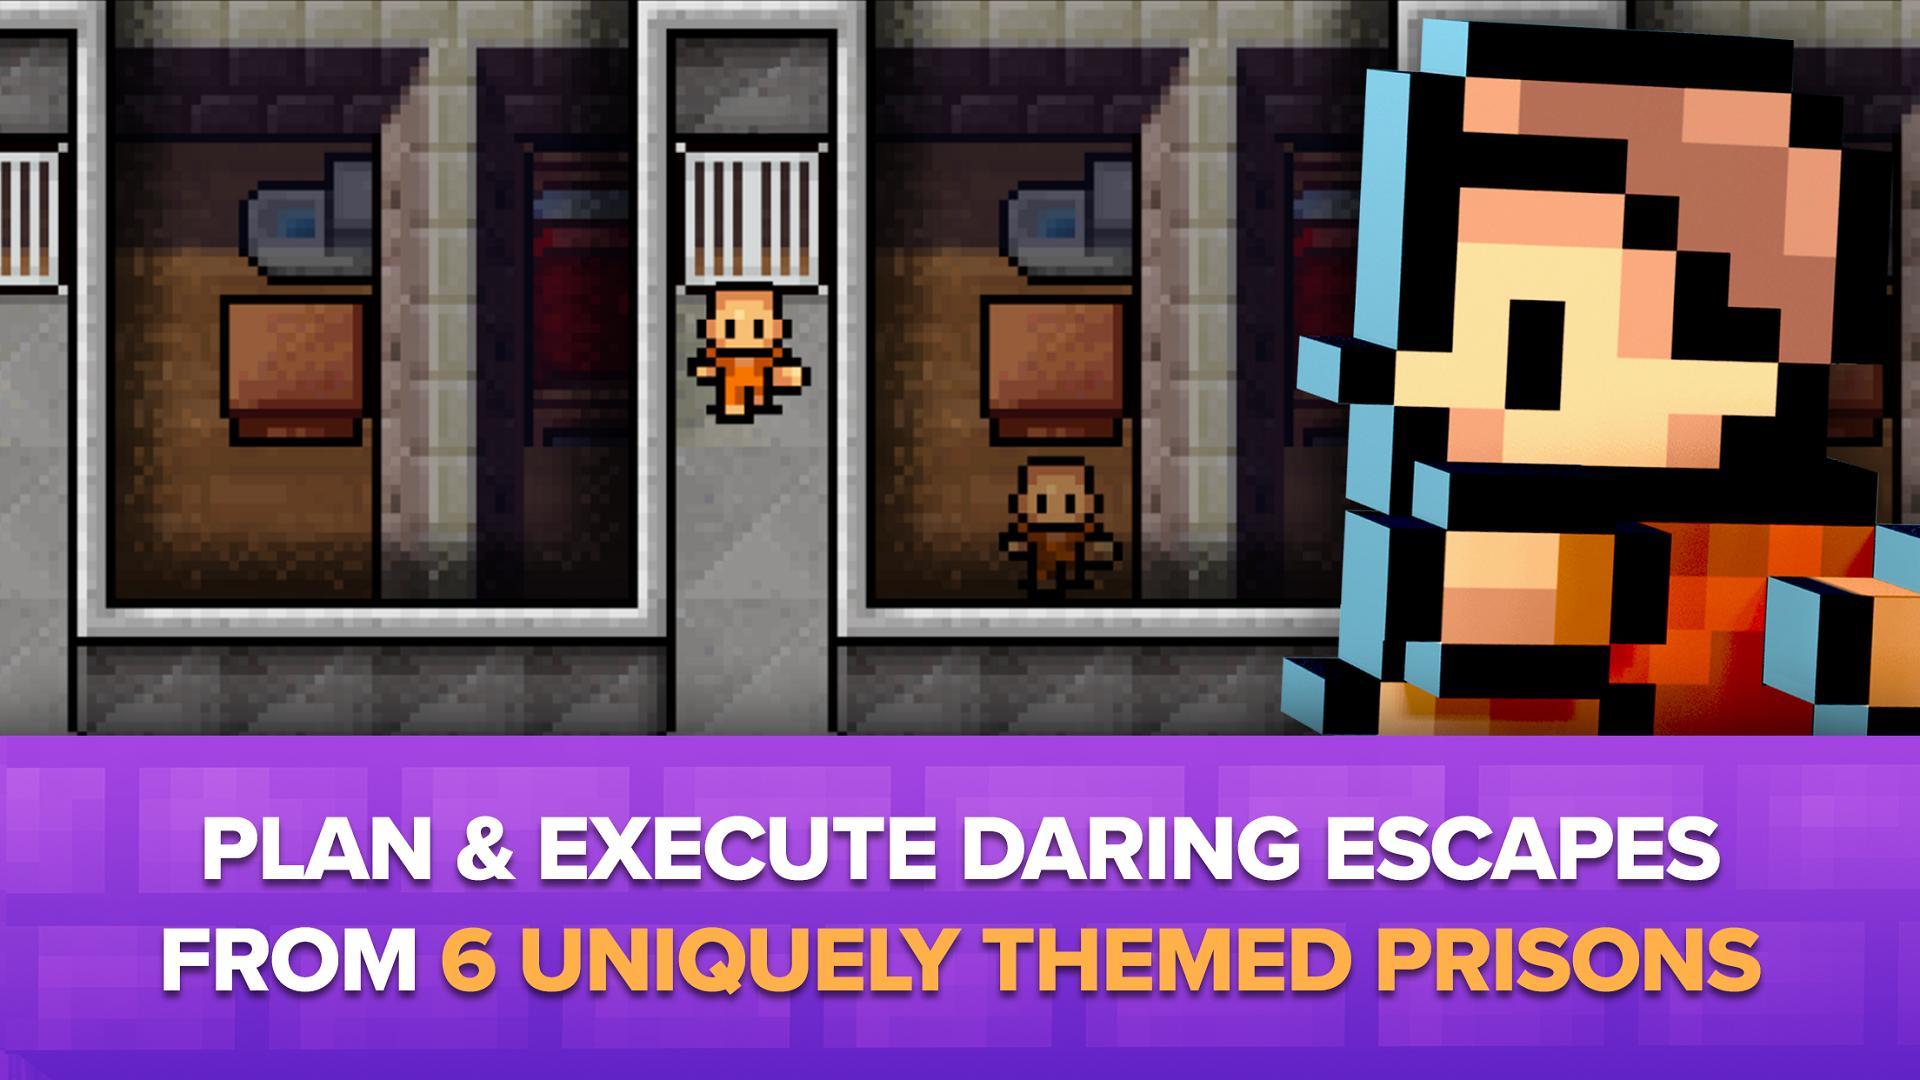 The Escapists: Prison Escape – Trial Edition 636064 Screenshot 8